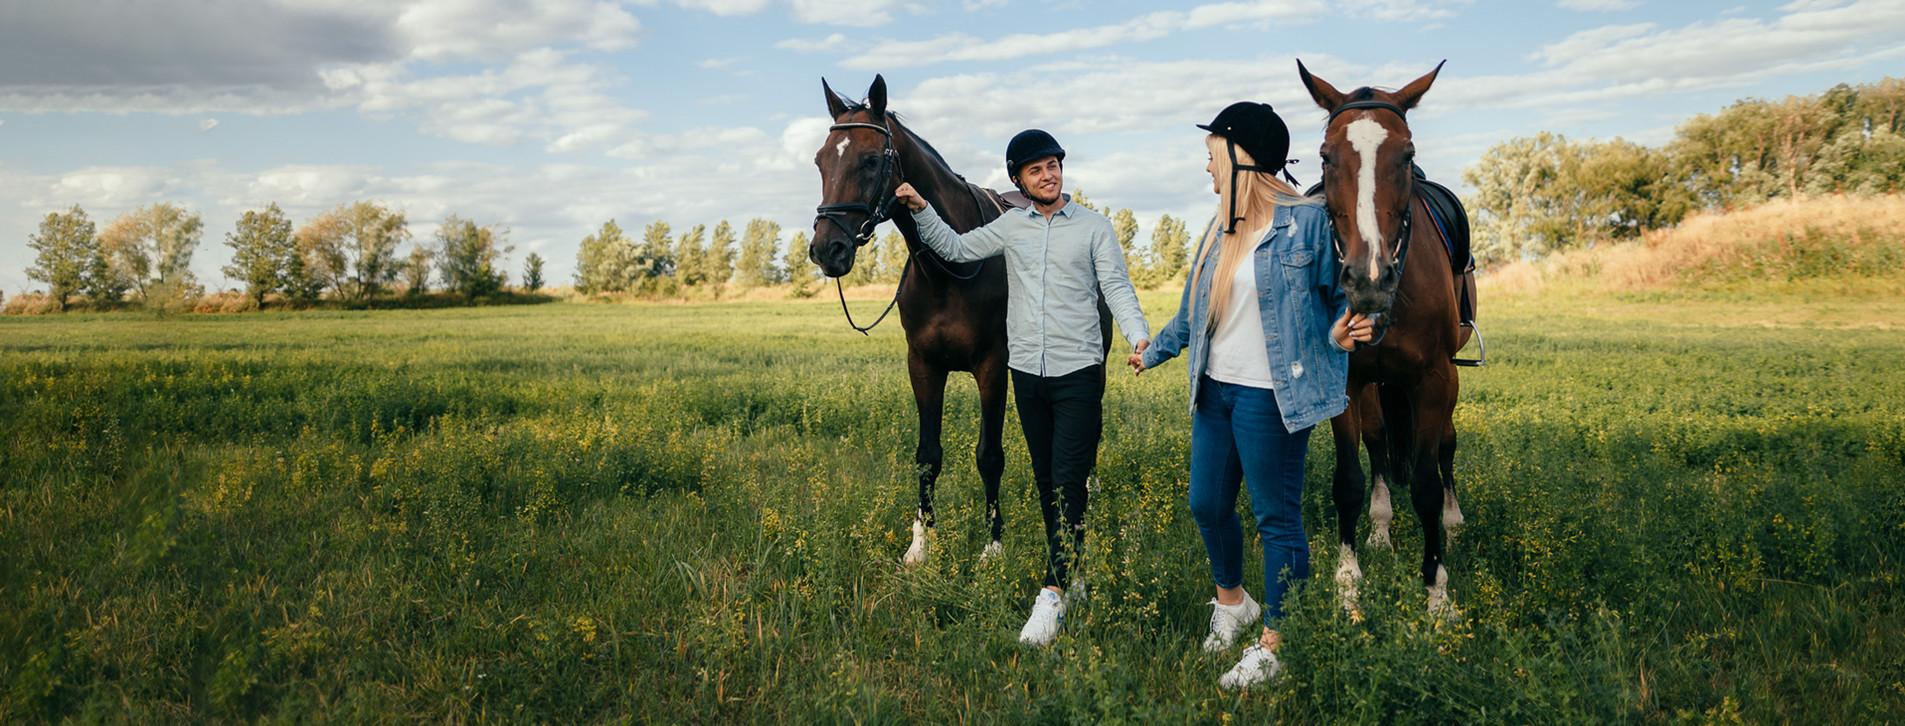 Фото 1 - Прогулка на лошадях для двоих